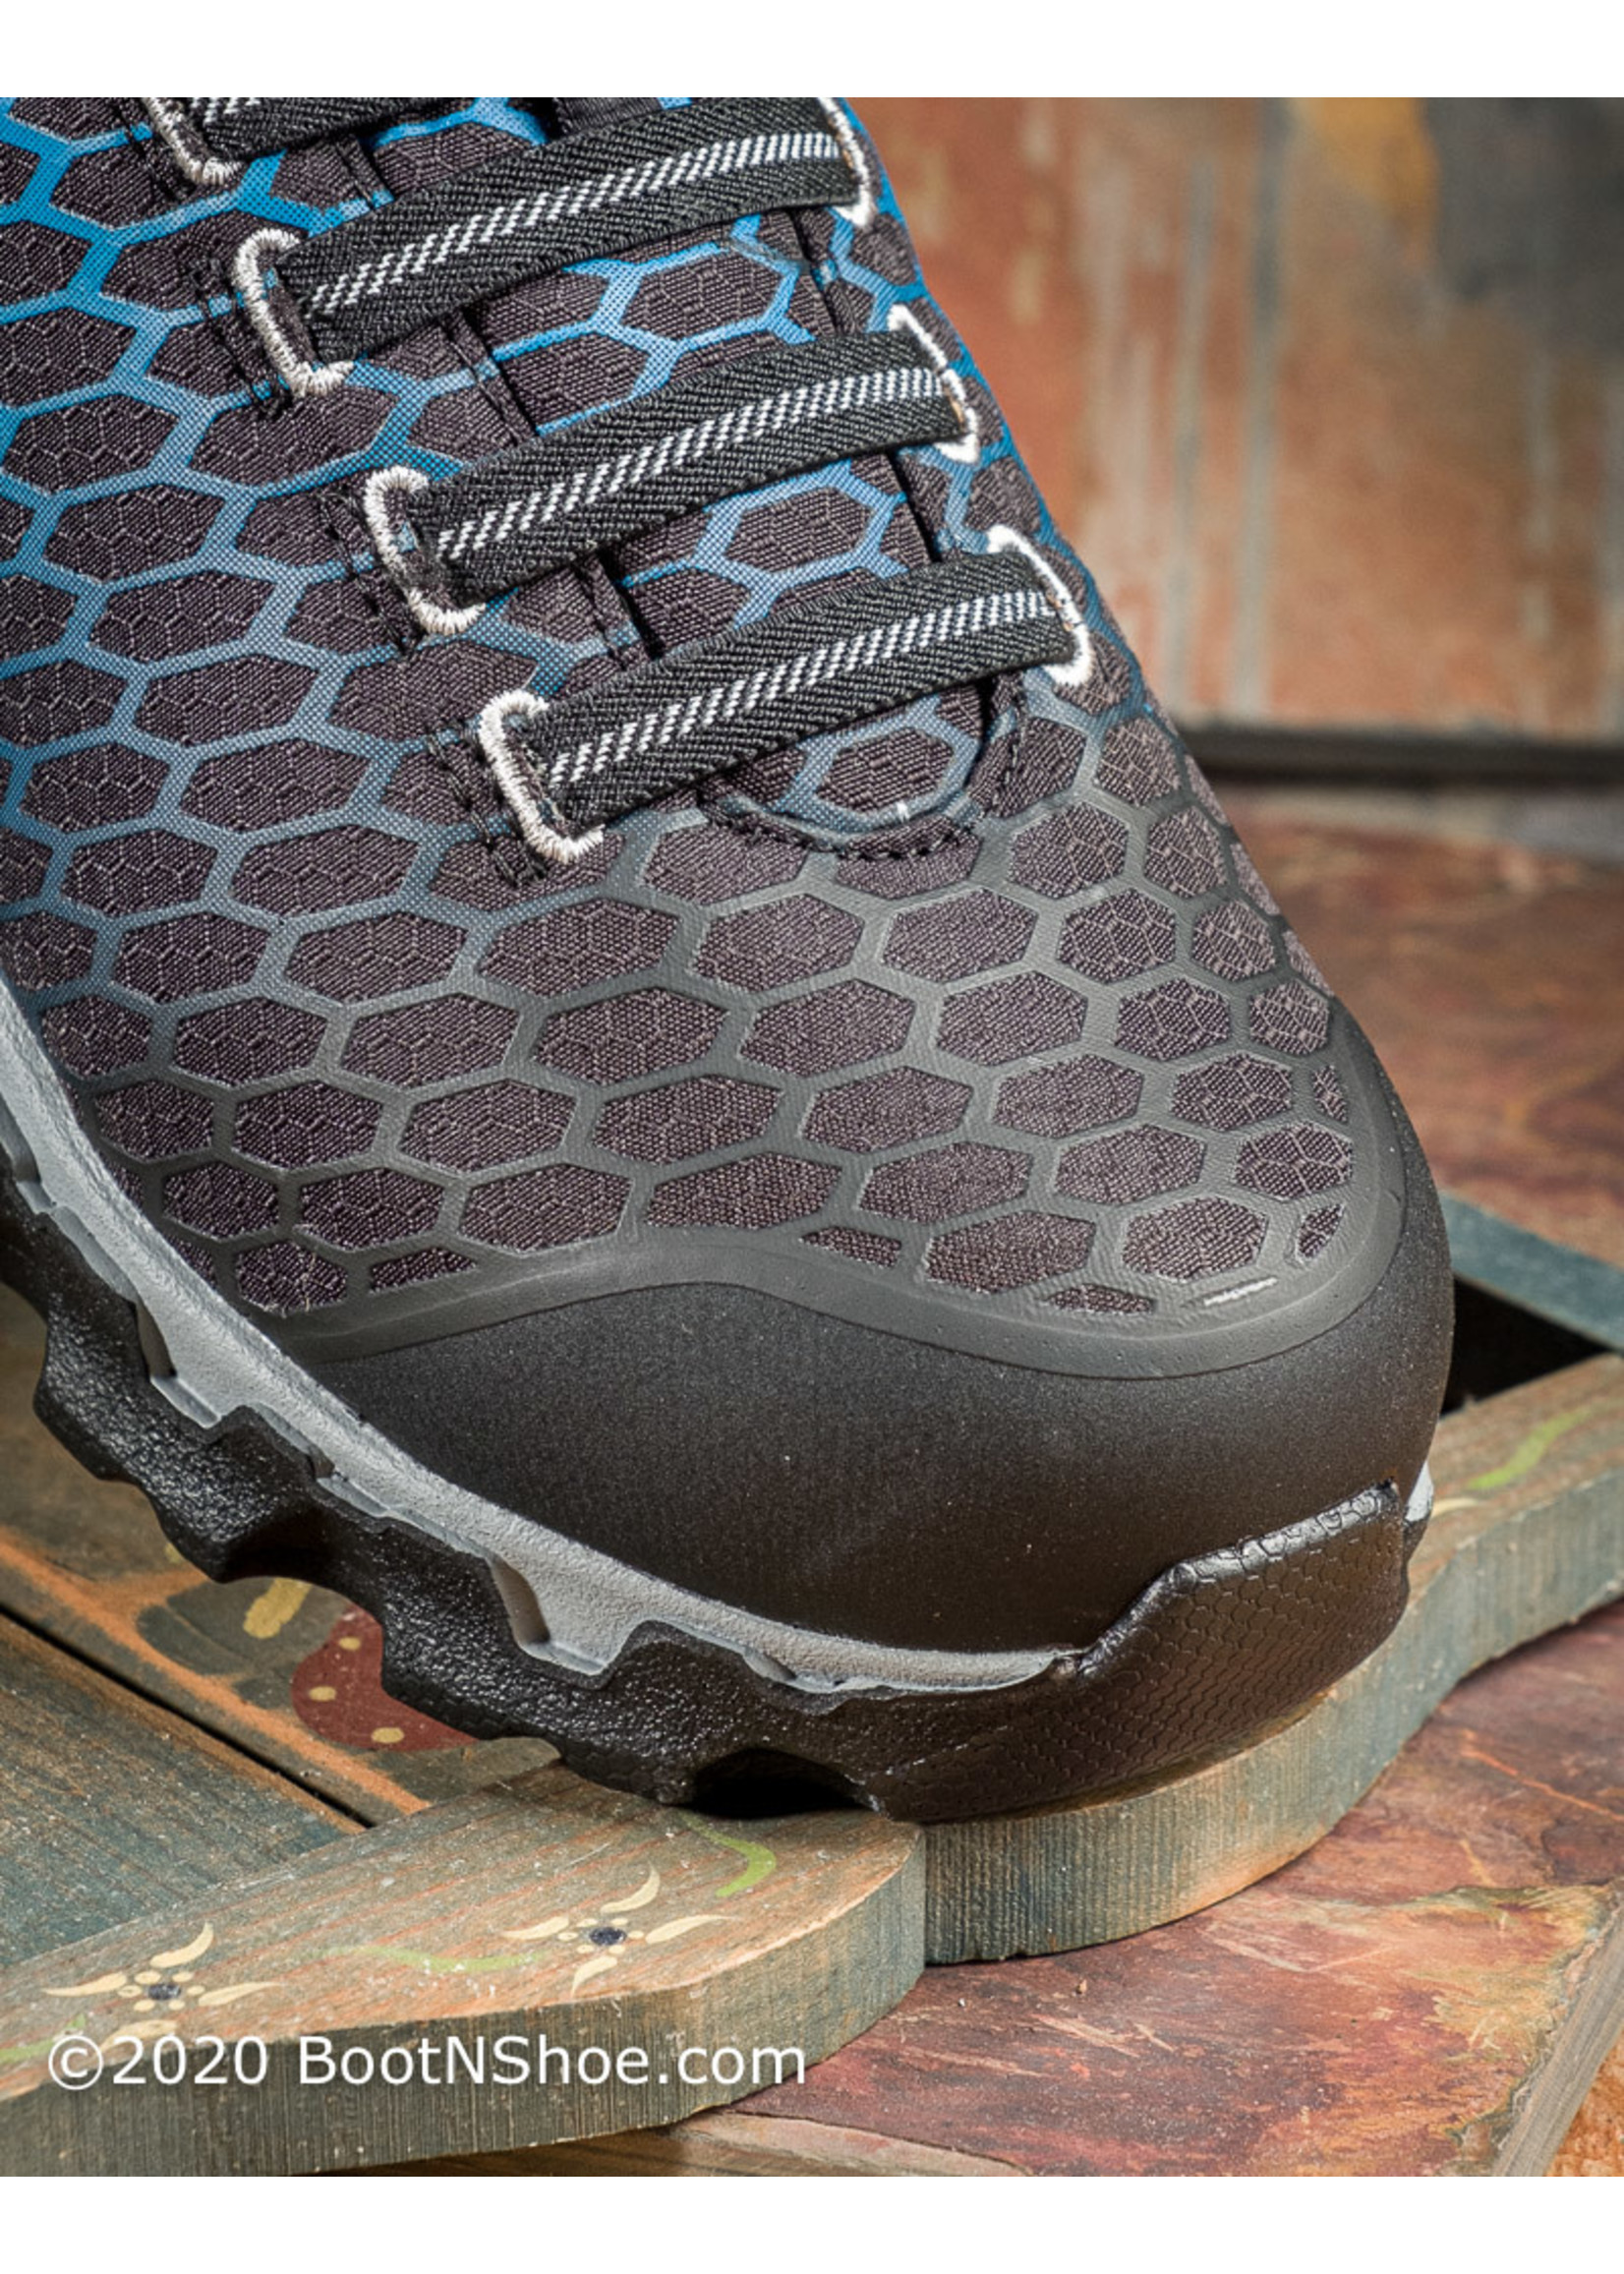 Timberland Pro Women's Powertrain Sport Slip On Alloy Toe SD Work Shoes A1I54